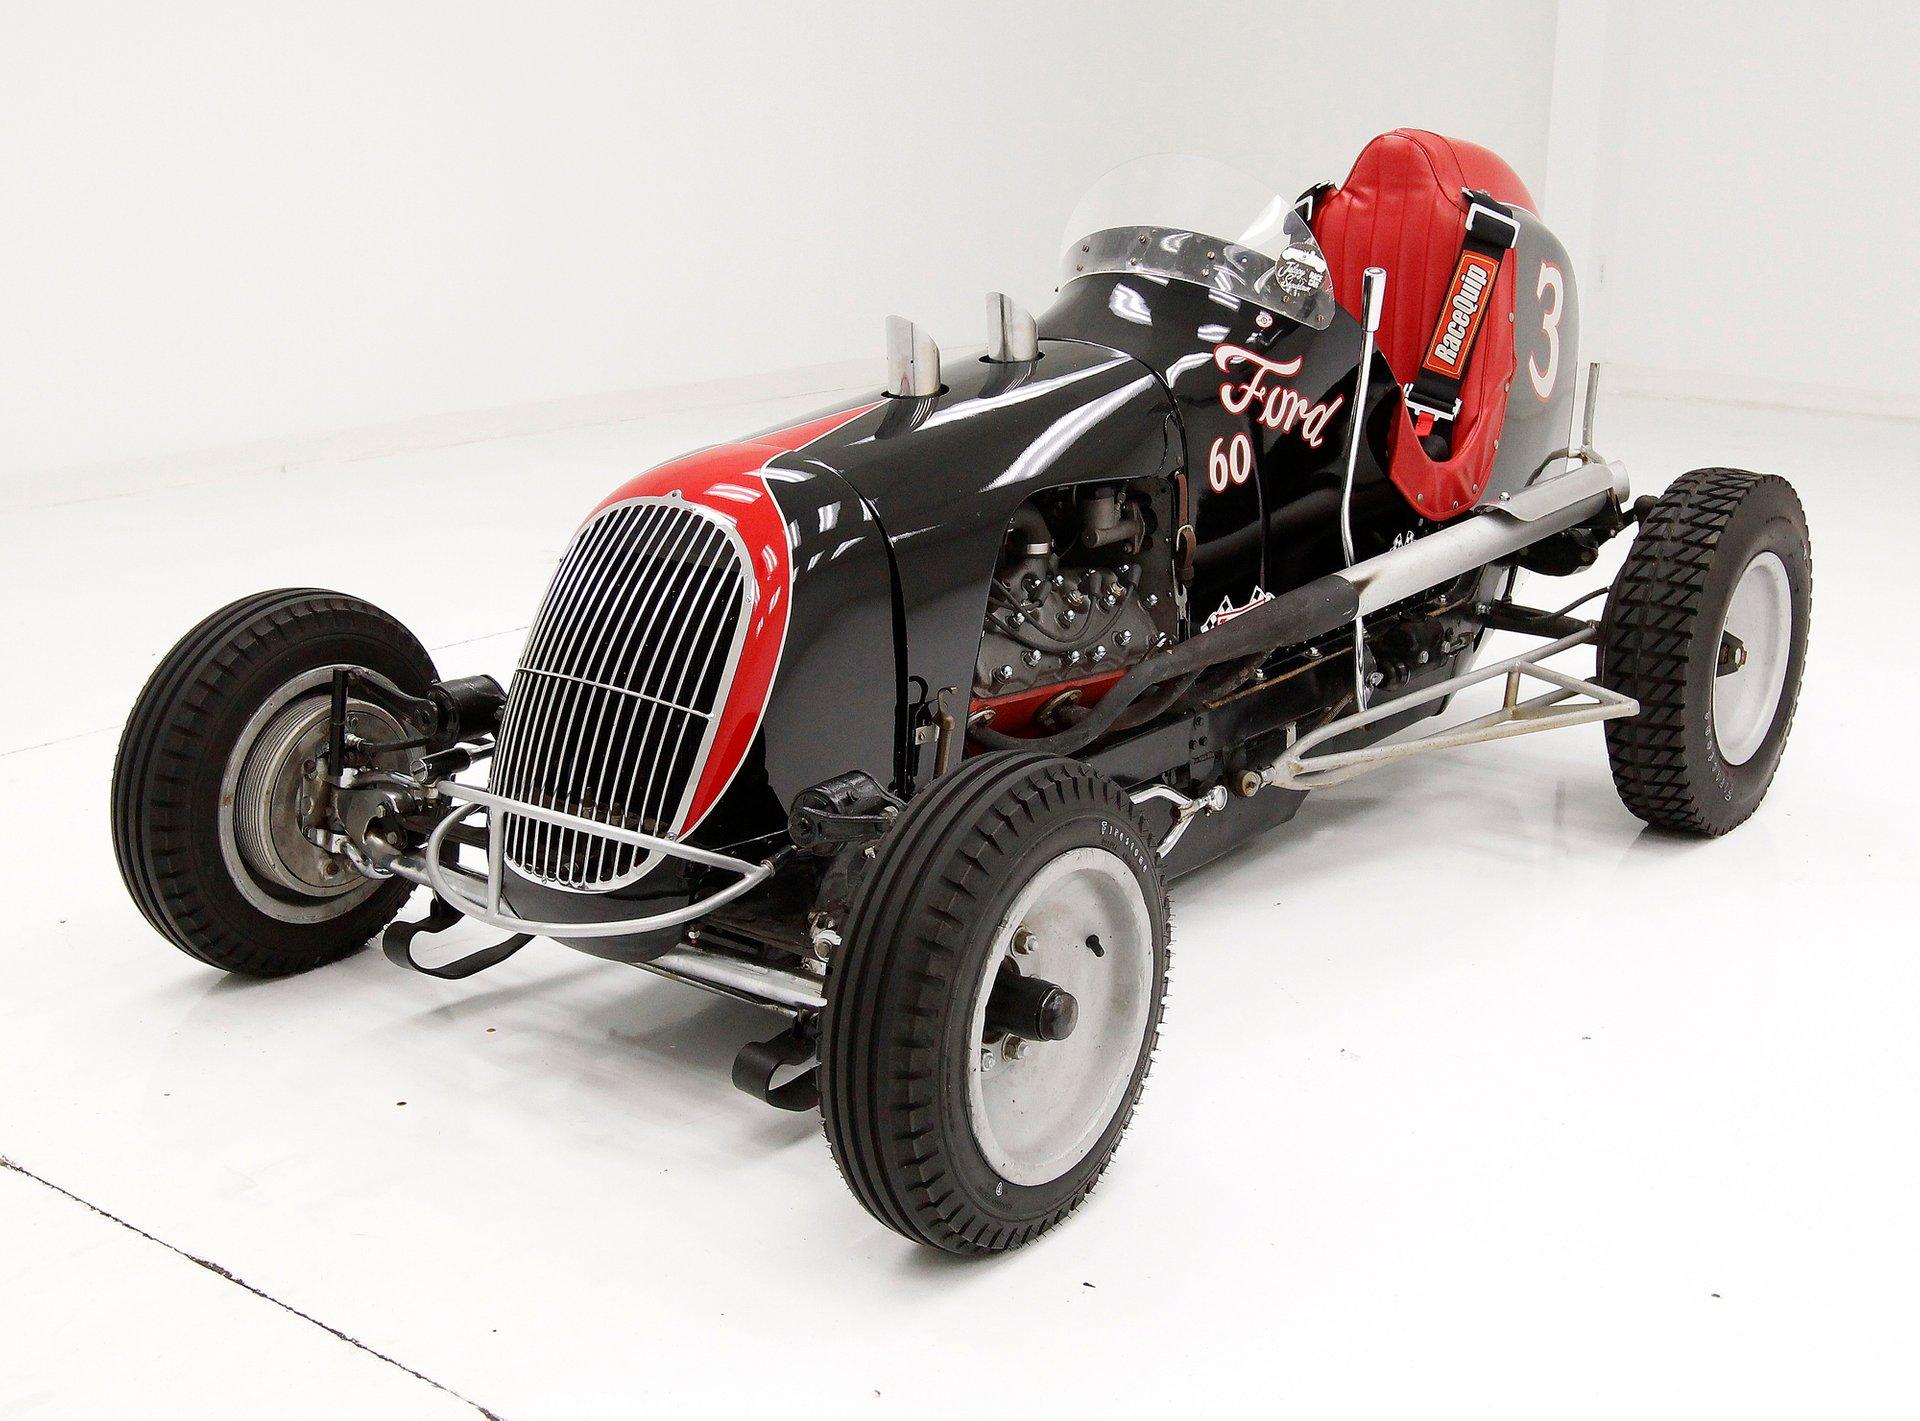 1946 Hillagas Midget Race Car